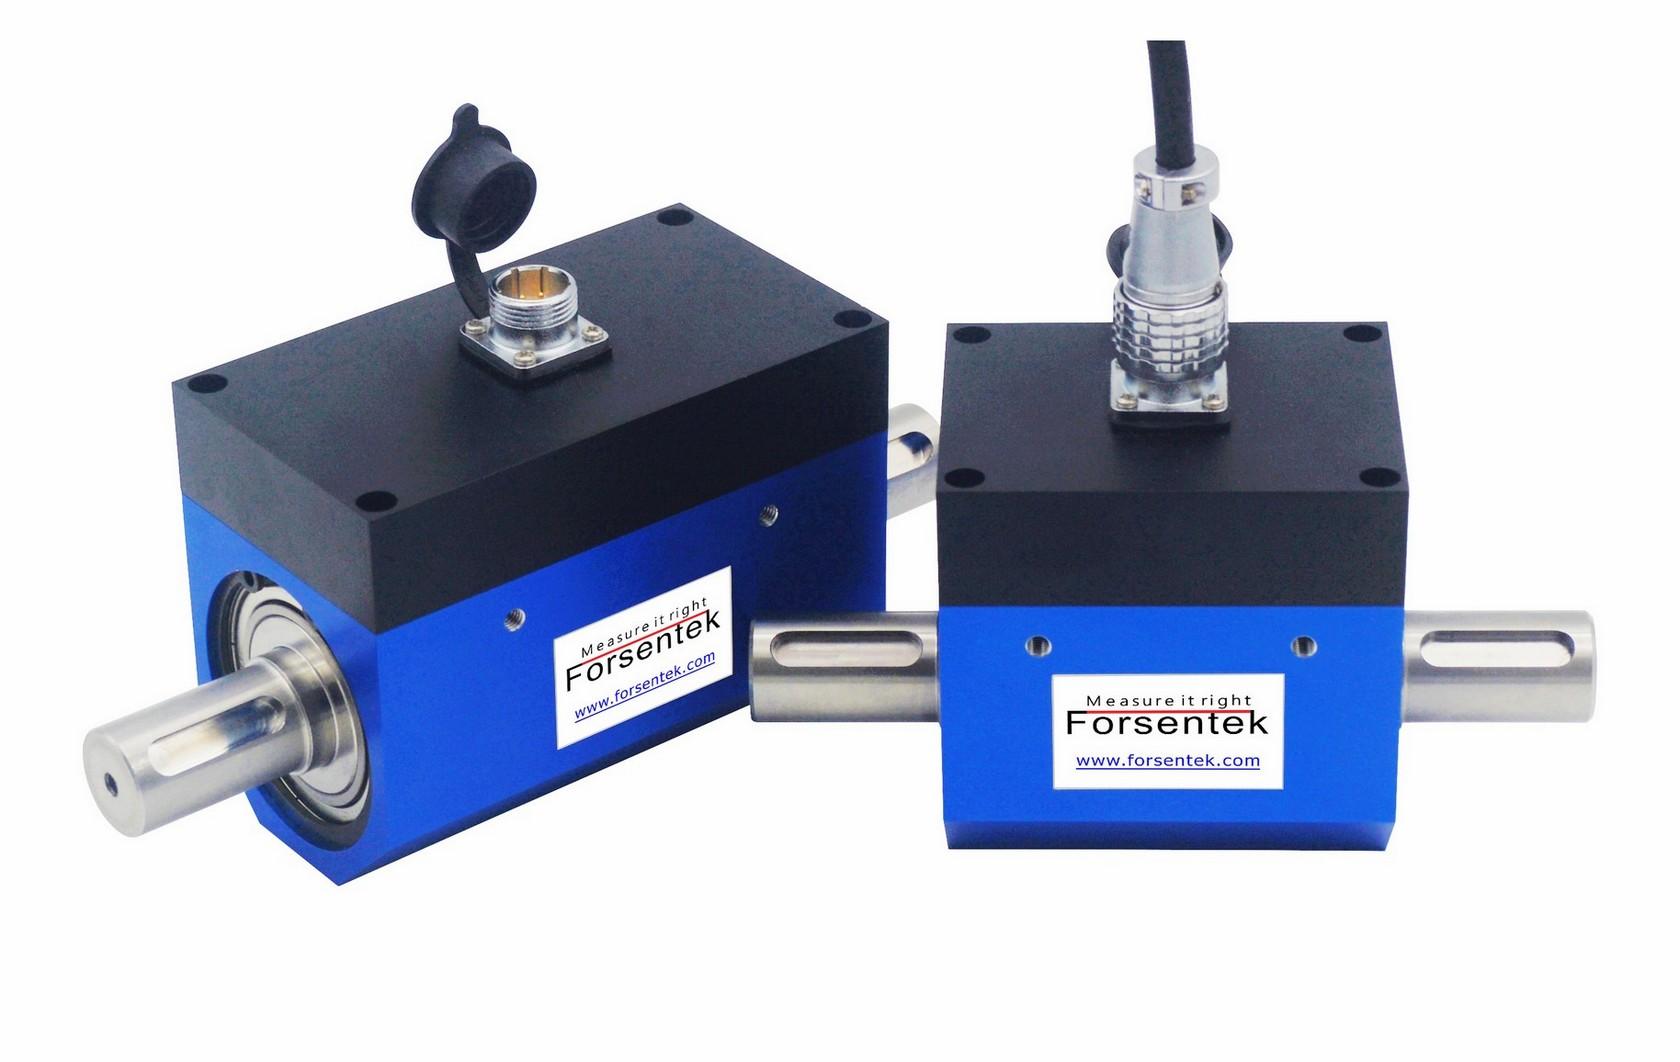 contactless torque sensor